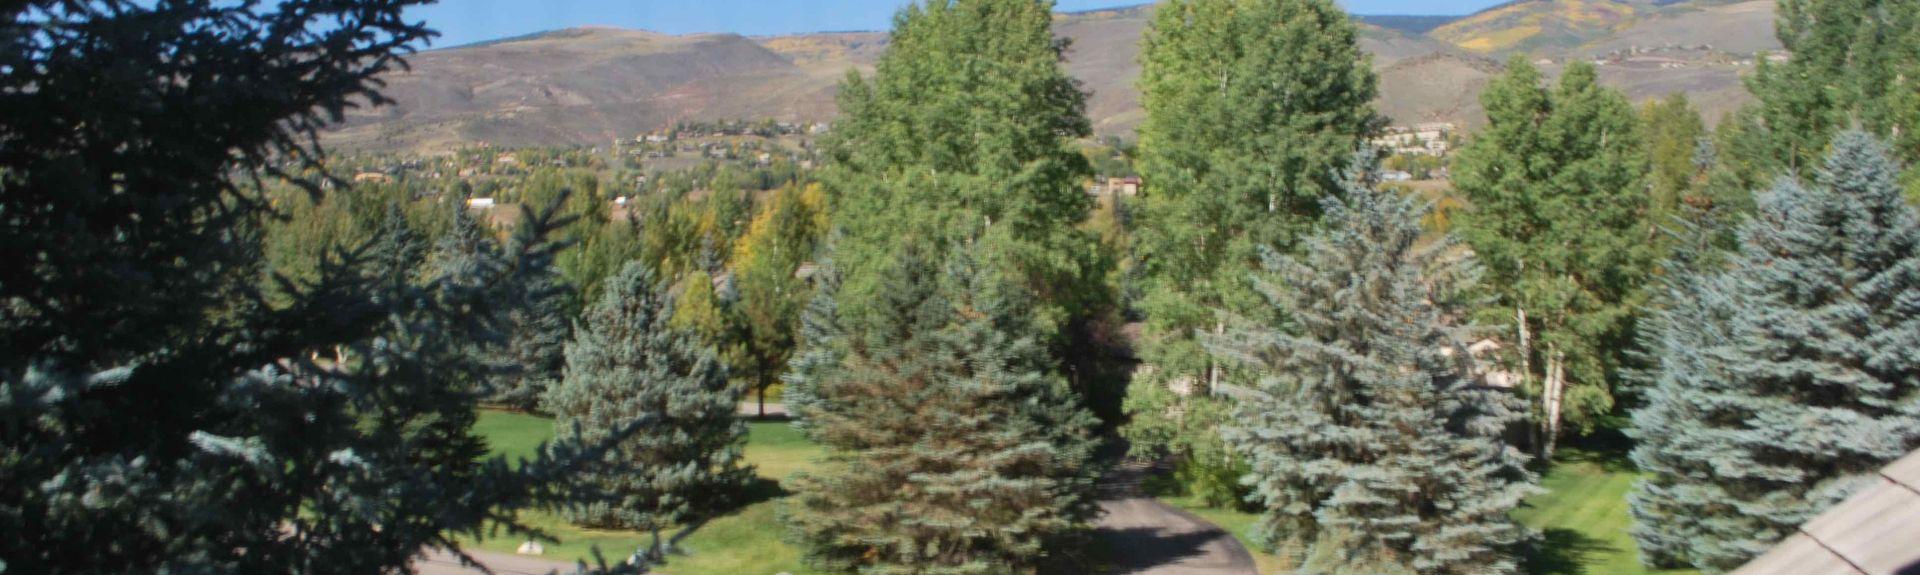 Arrowhead Village (Edwards, Colorado, Stati Uniti)